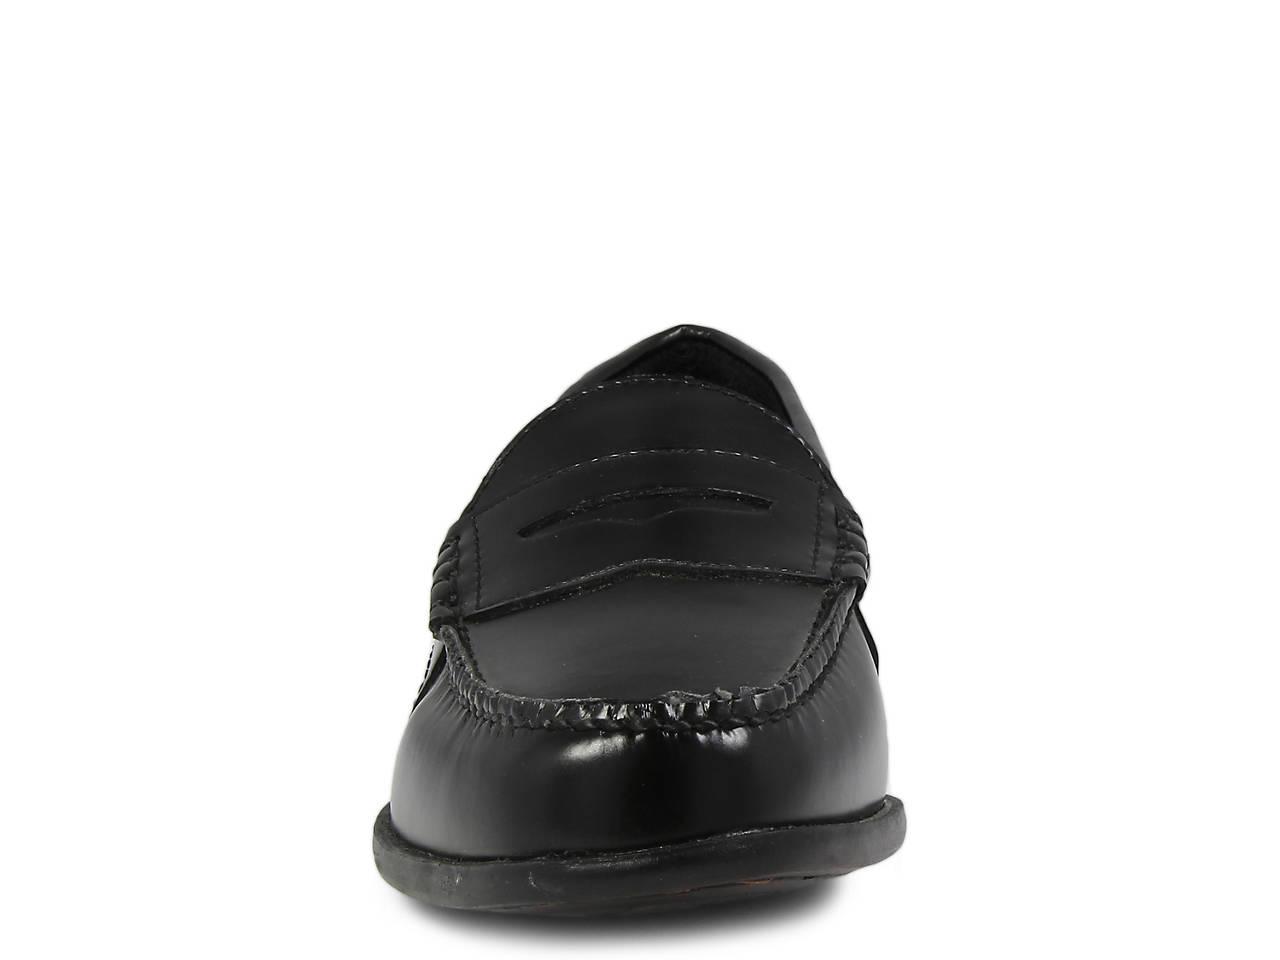 59d914bb343 Nunn Bush Kent Penny Loafer Men s Shoes